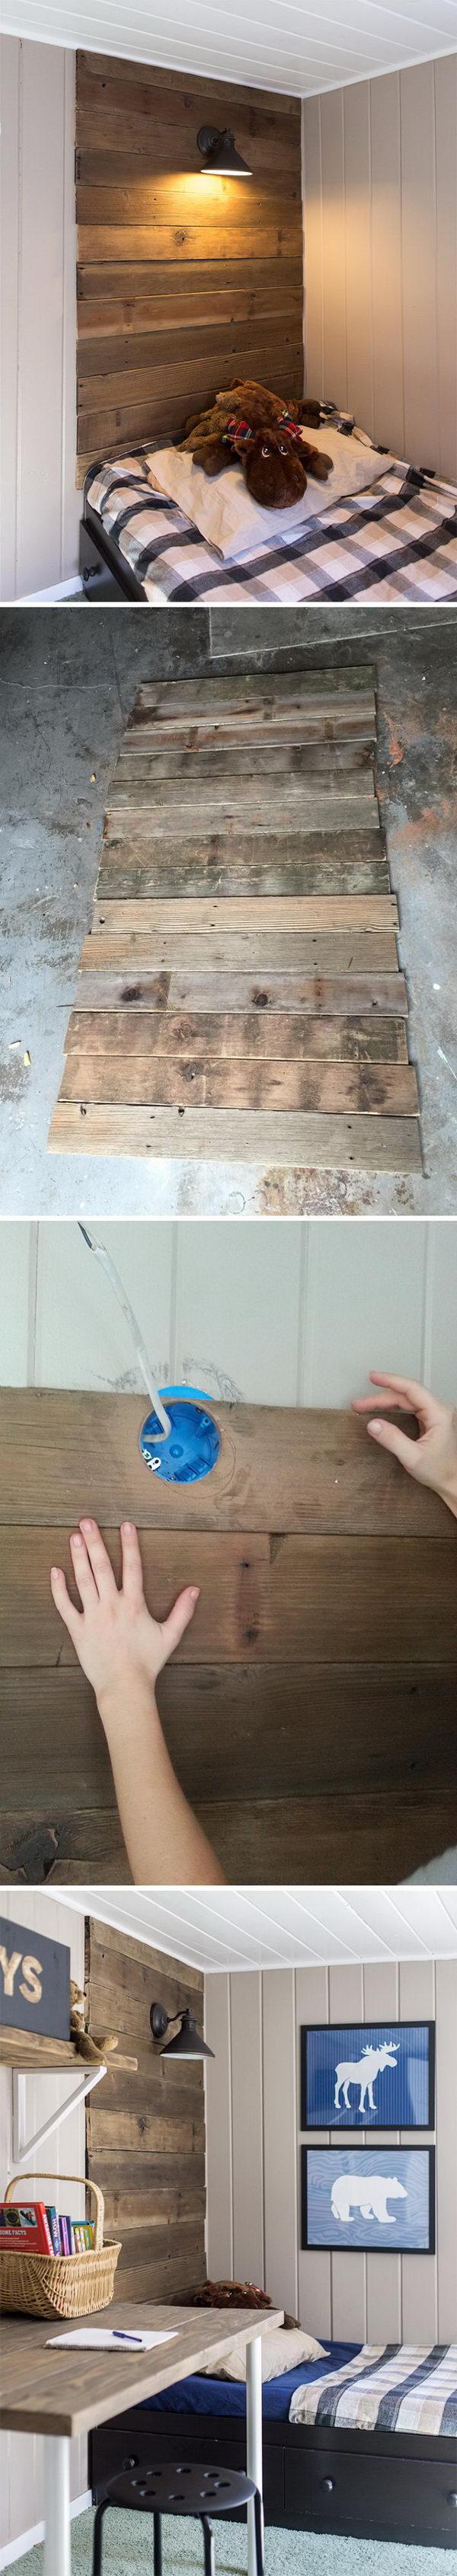 DIY Rustic Wood Headboard With Light.